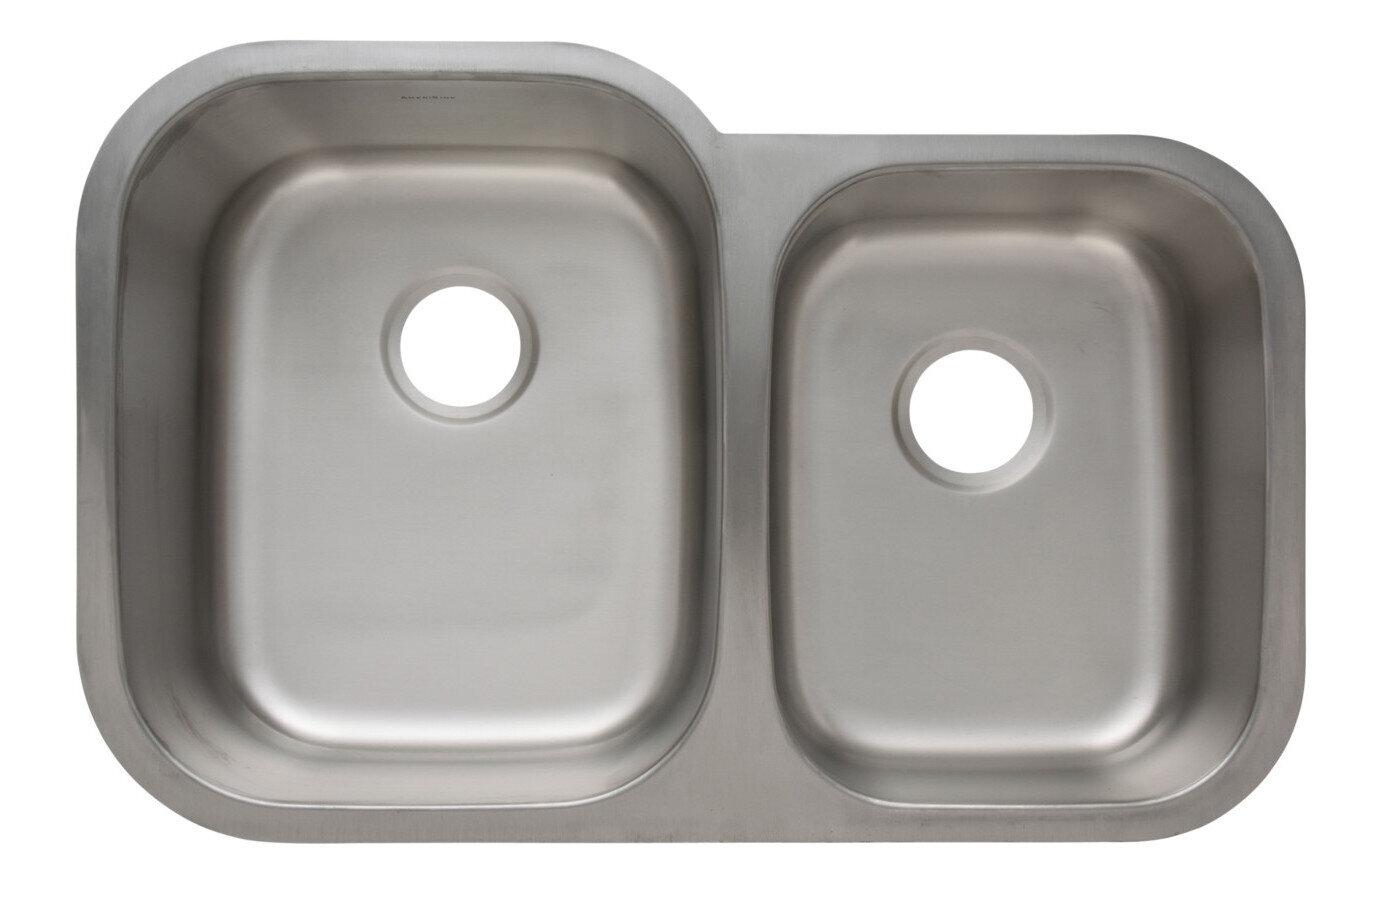 Trend 16 Gauge 304 Stainless Steel Double Undermount Sink